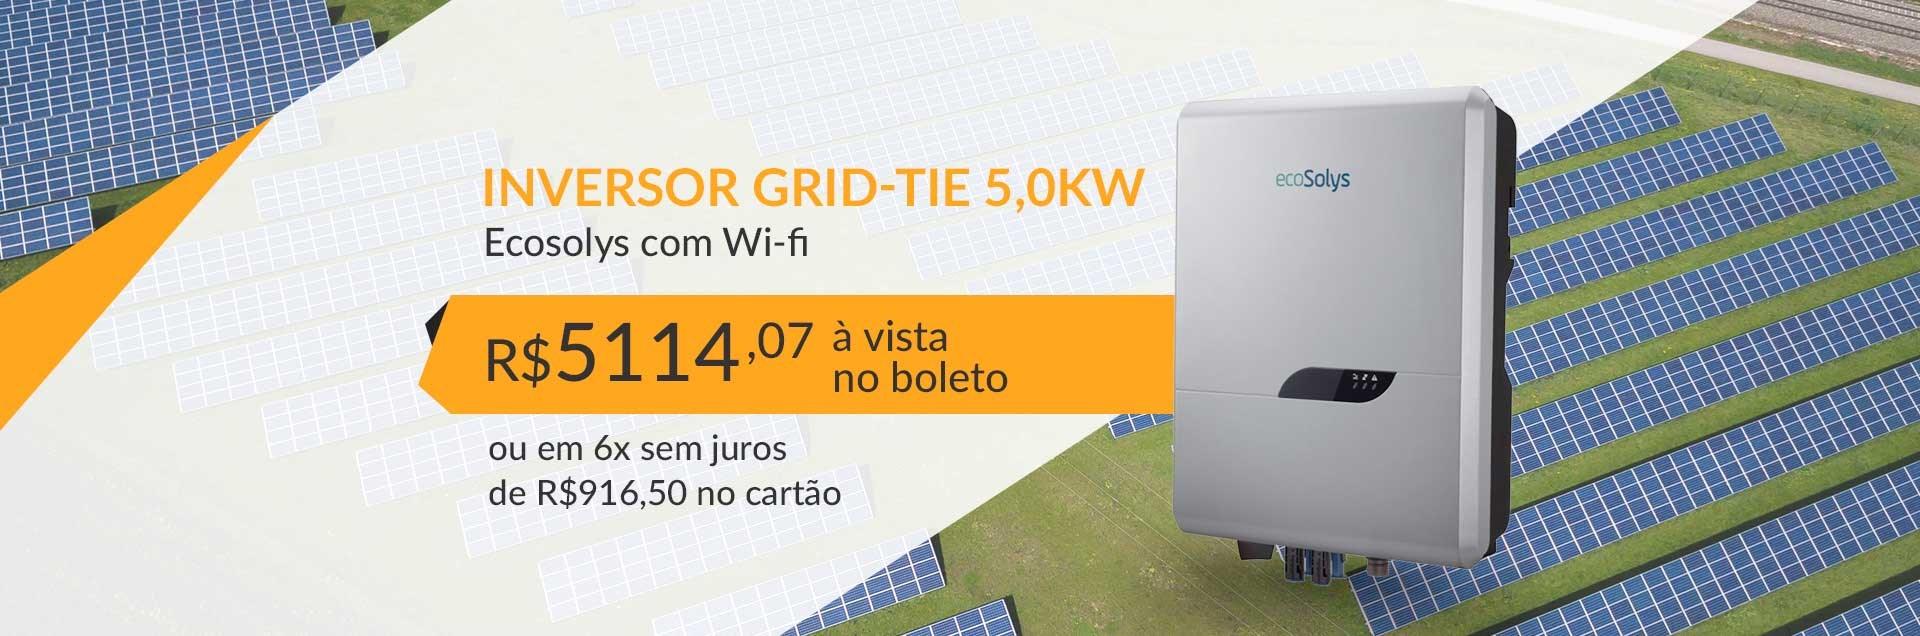 Inversor Grid-Tie 5,0kW Ecosolys com Wi-fi